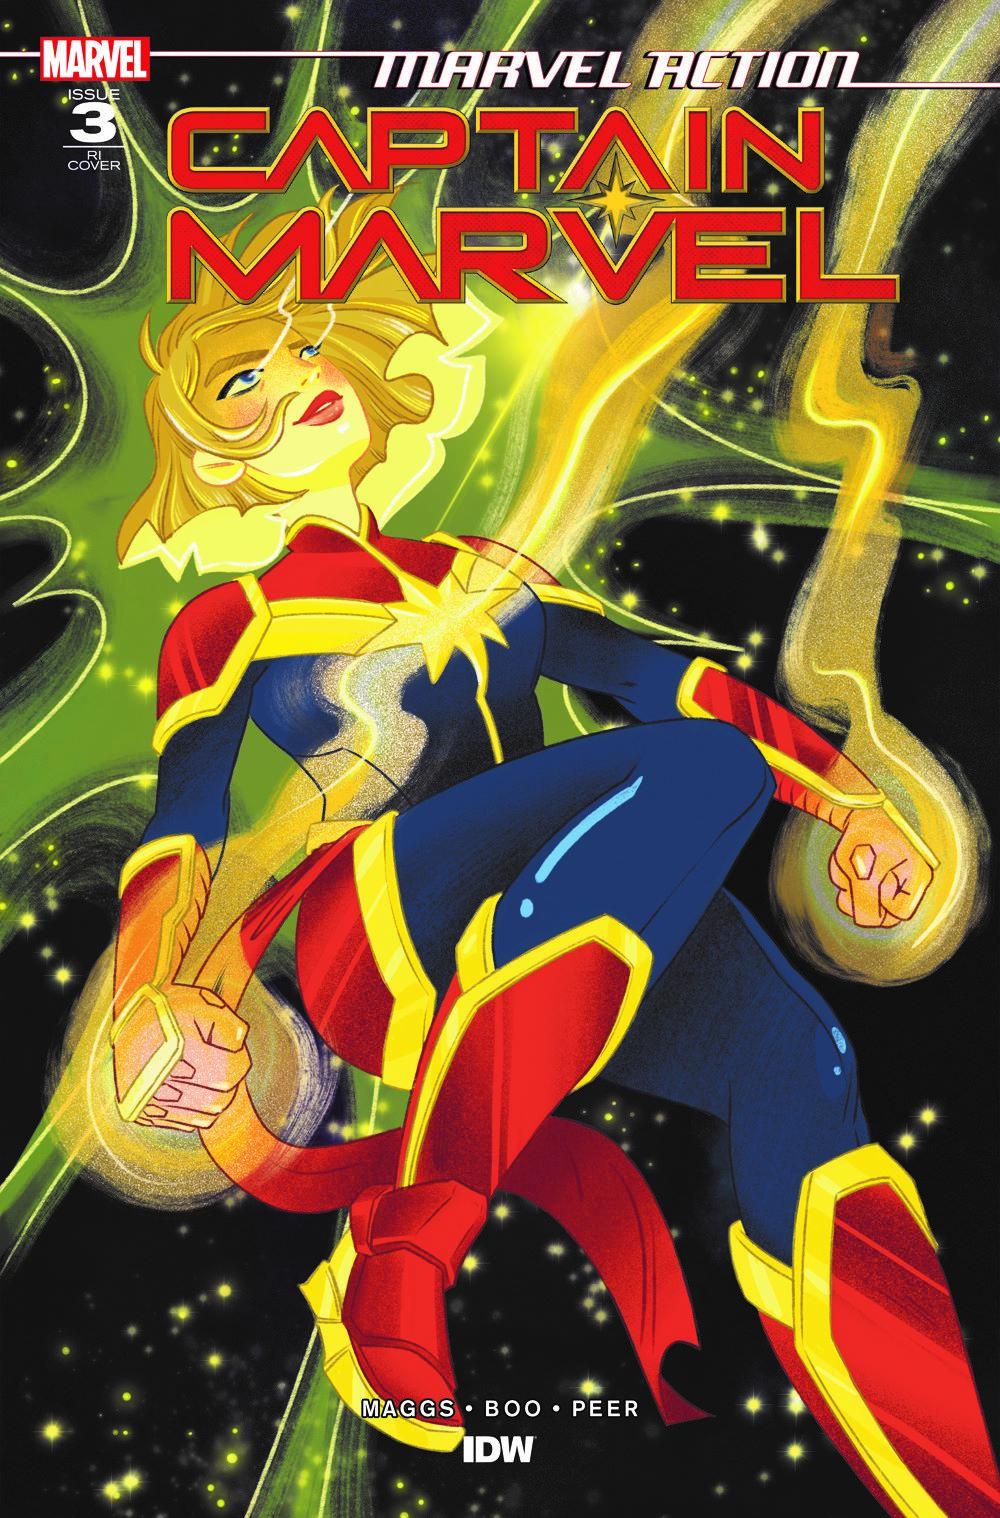 CaptainMarvel_RIcvr_03 ComicList Previews: MARVEL ACTION CAPTAIN MARVEL VOLUME 2 #3